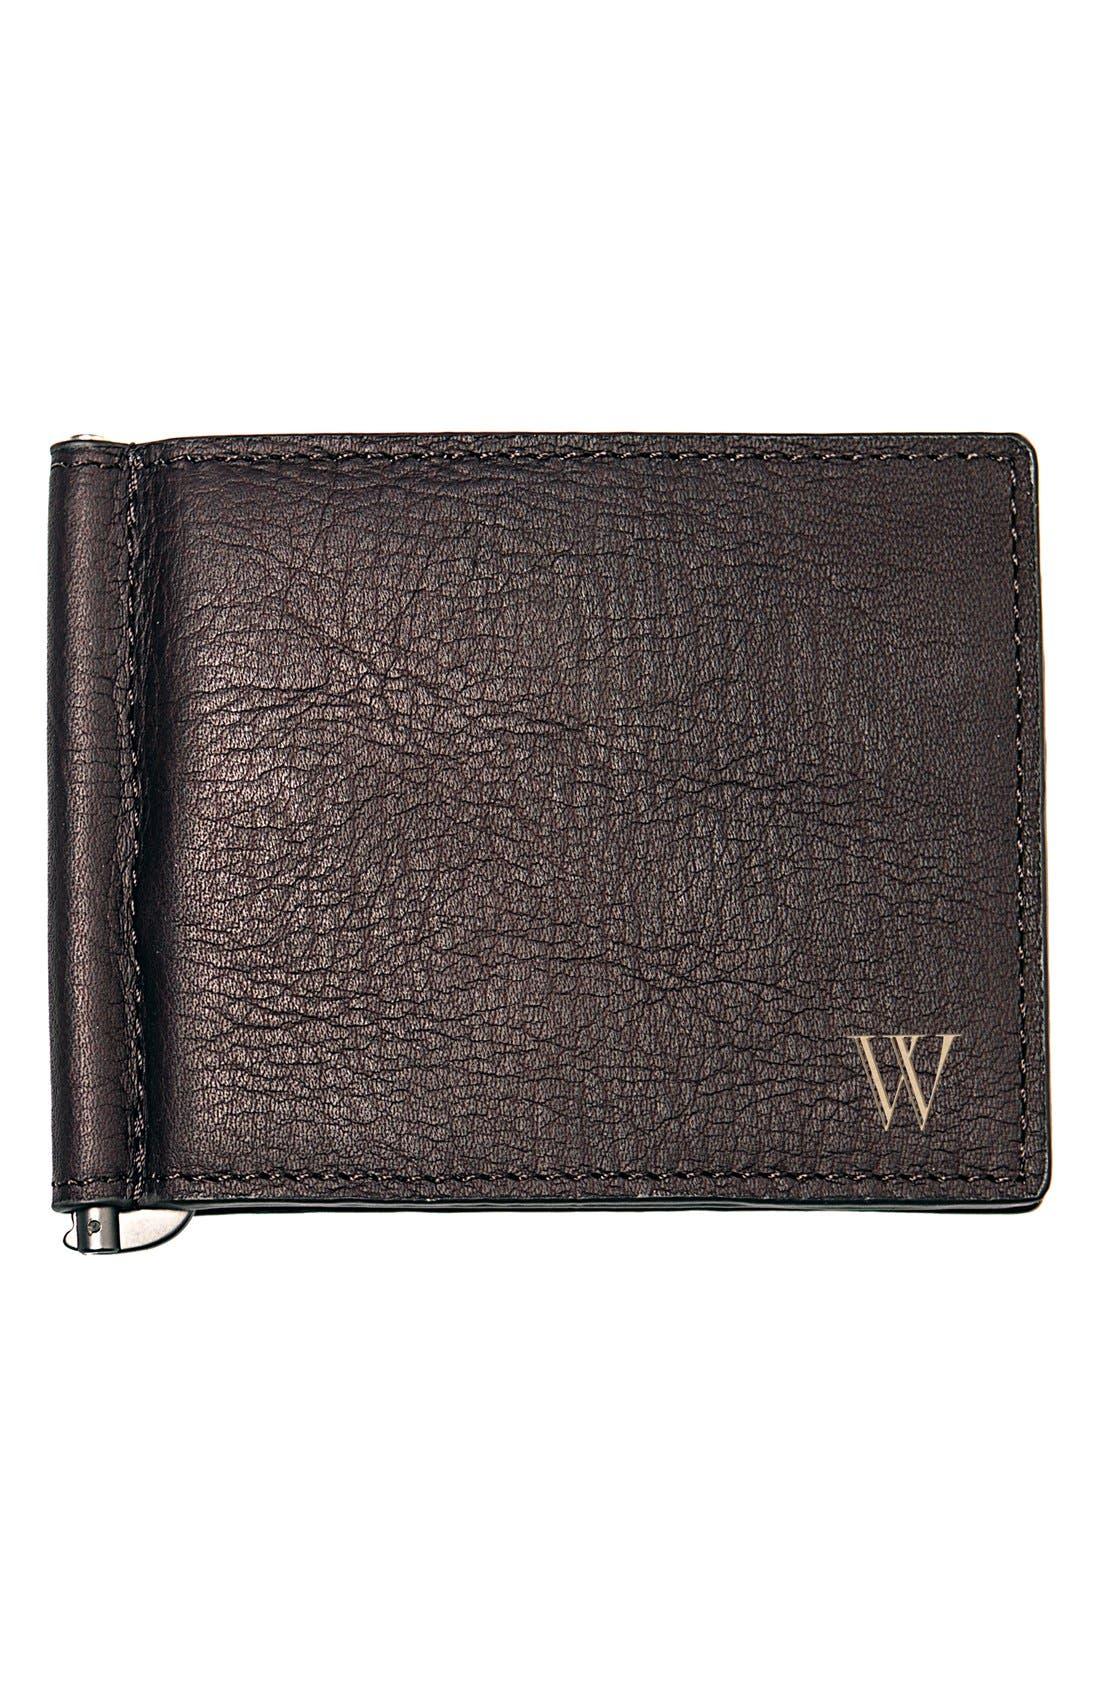 CATHYS CONCEPTS Monogram Leather Wallet & Money Clip